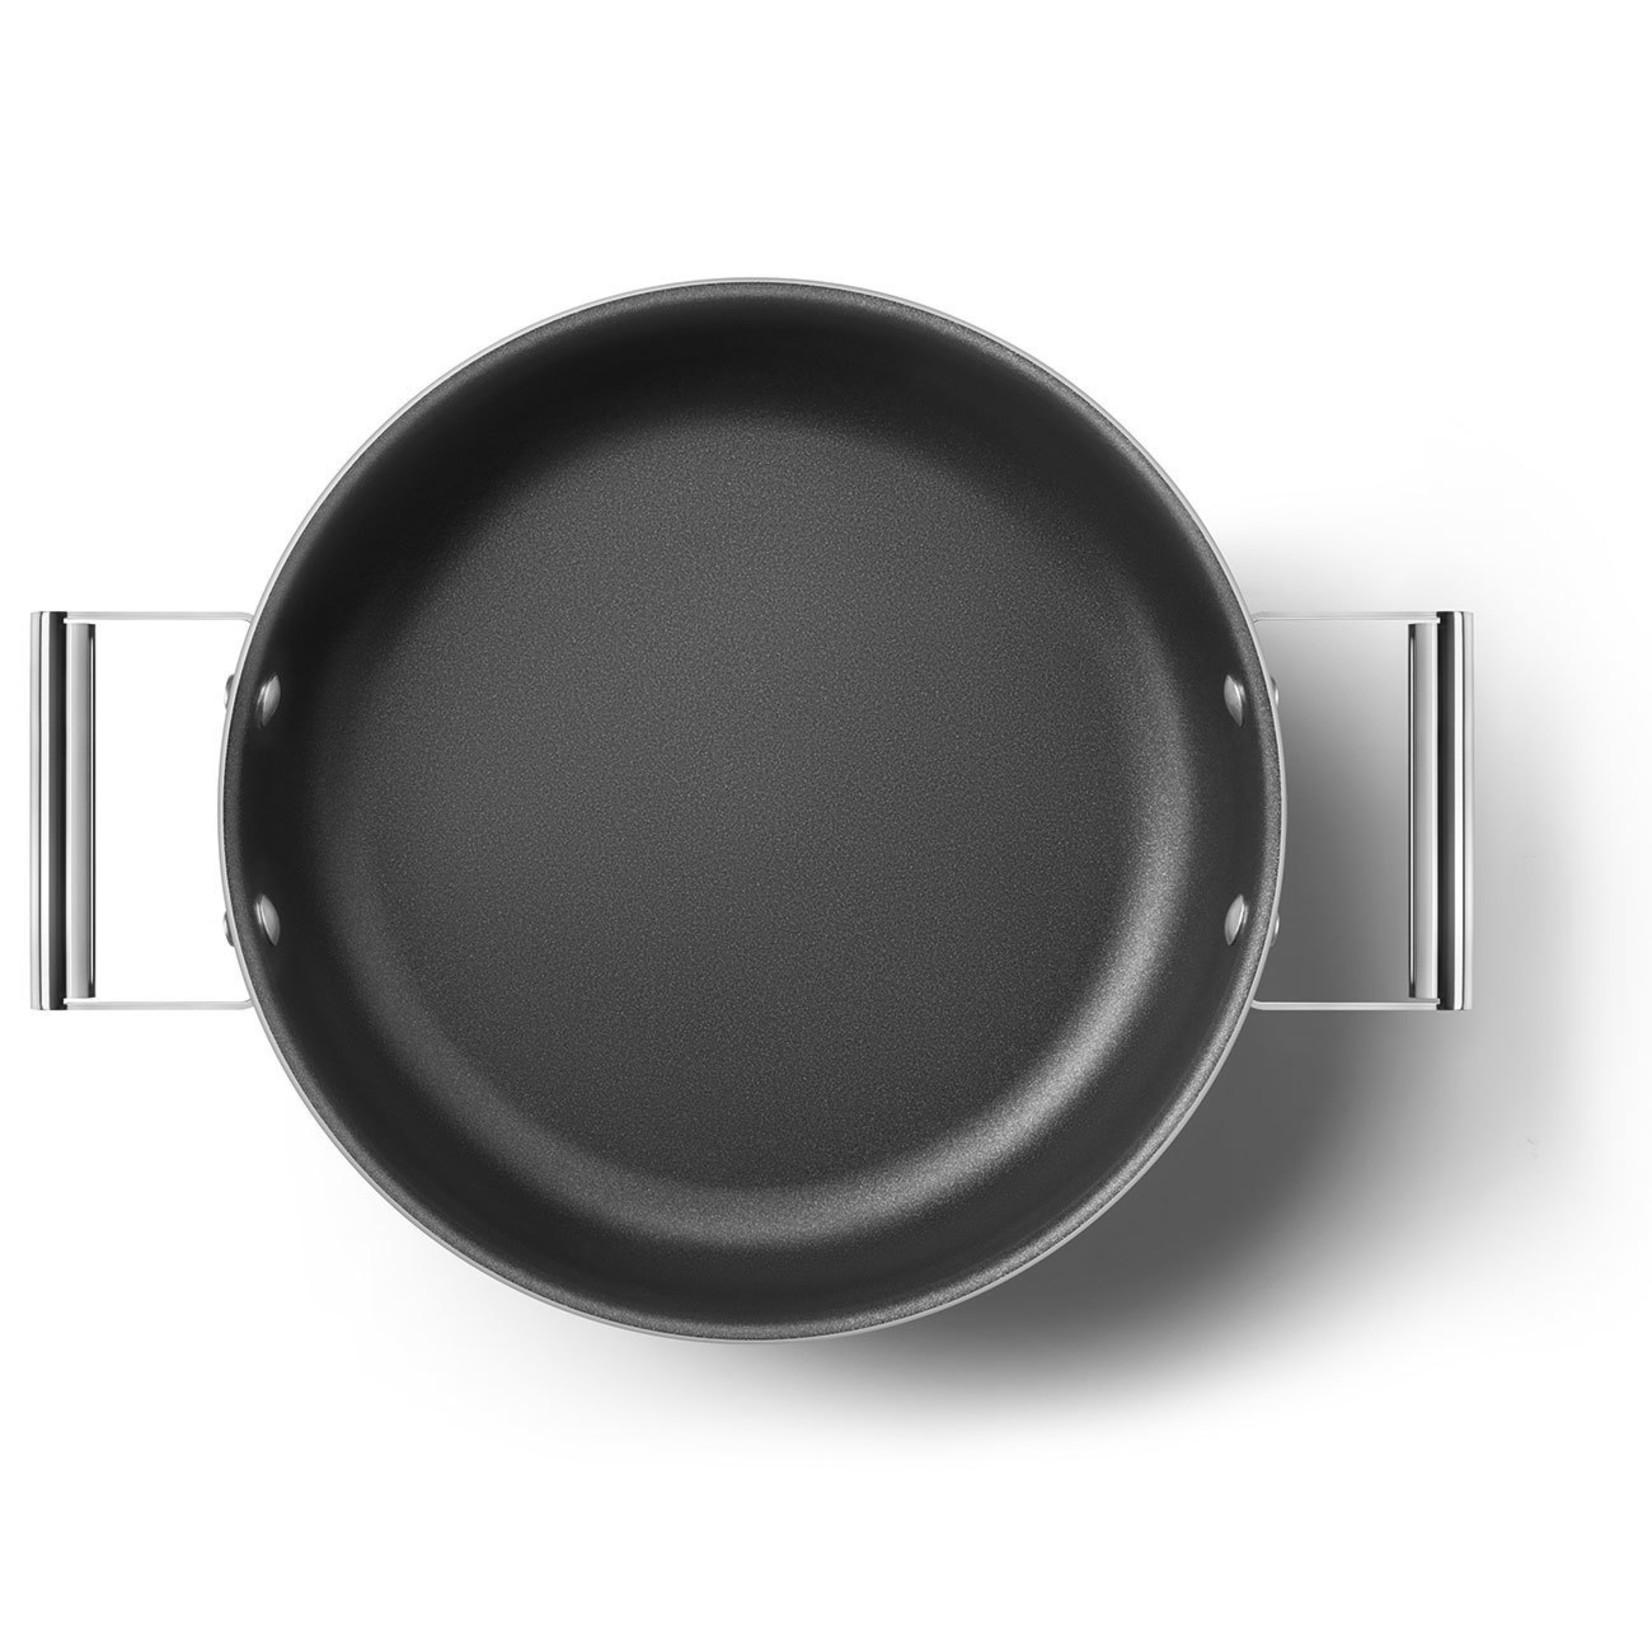 Smeg SMEG Smoorpan met deksel 28 cm, anti-aanbaklaag, rood mat